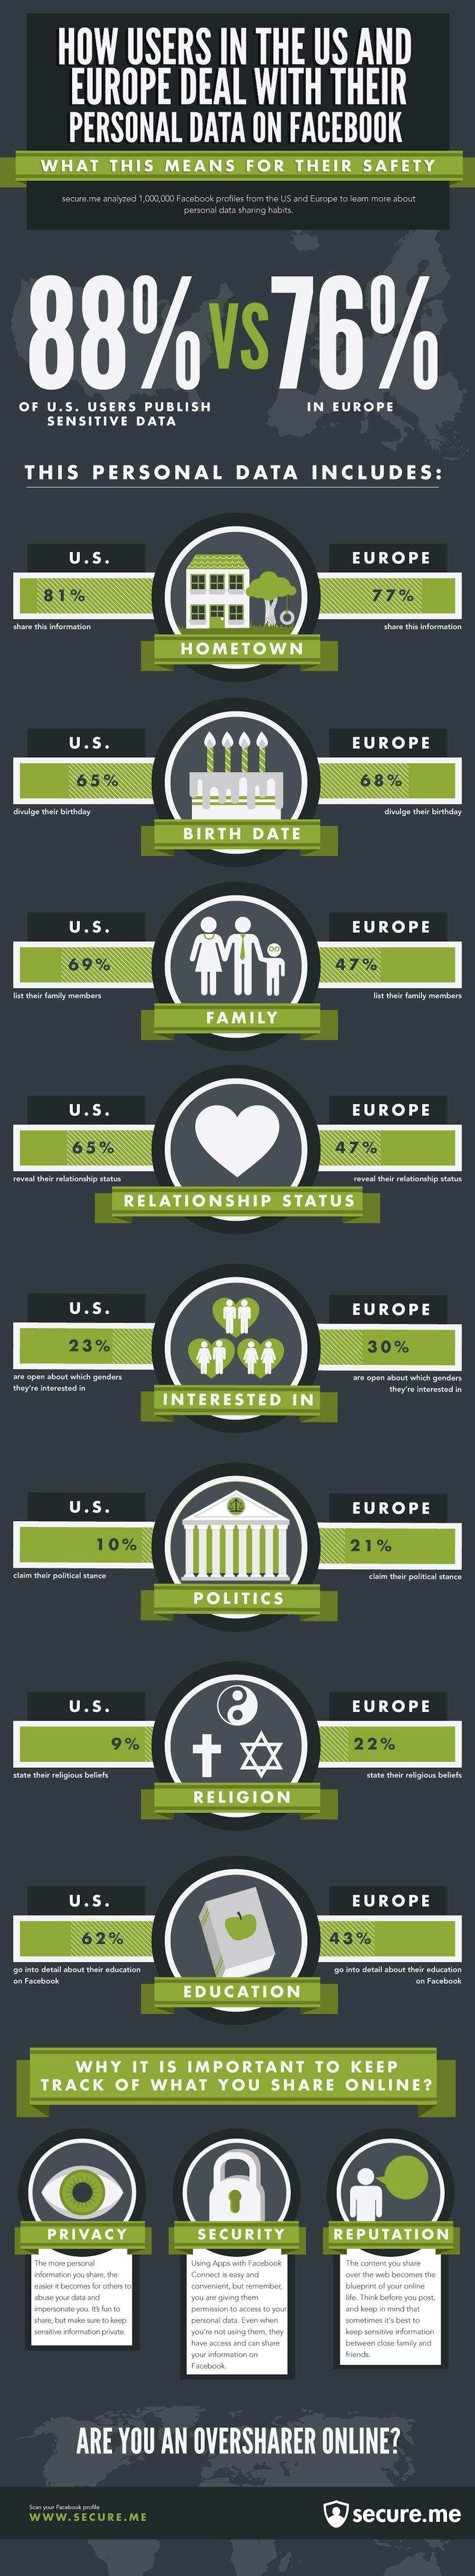 US vs Europe sharing infographic